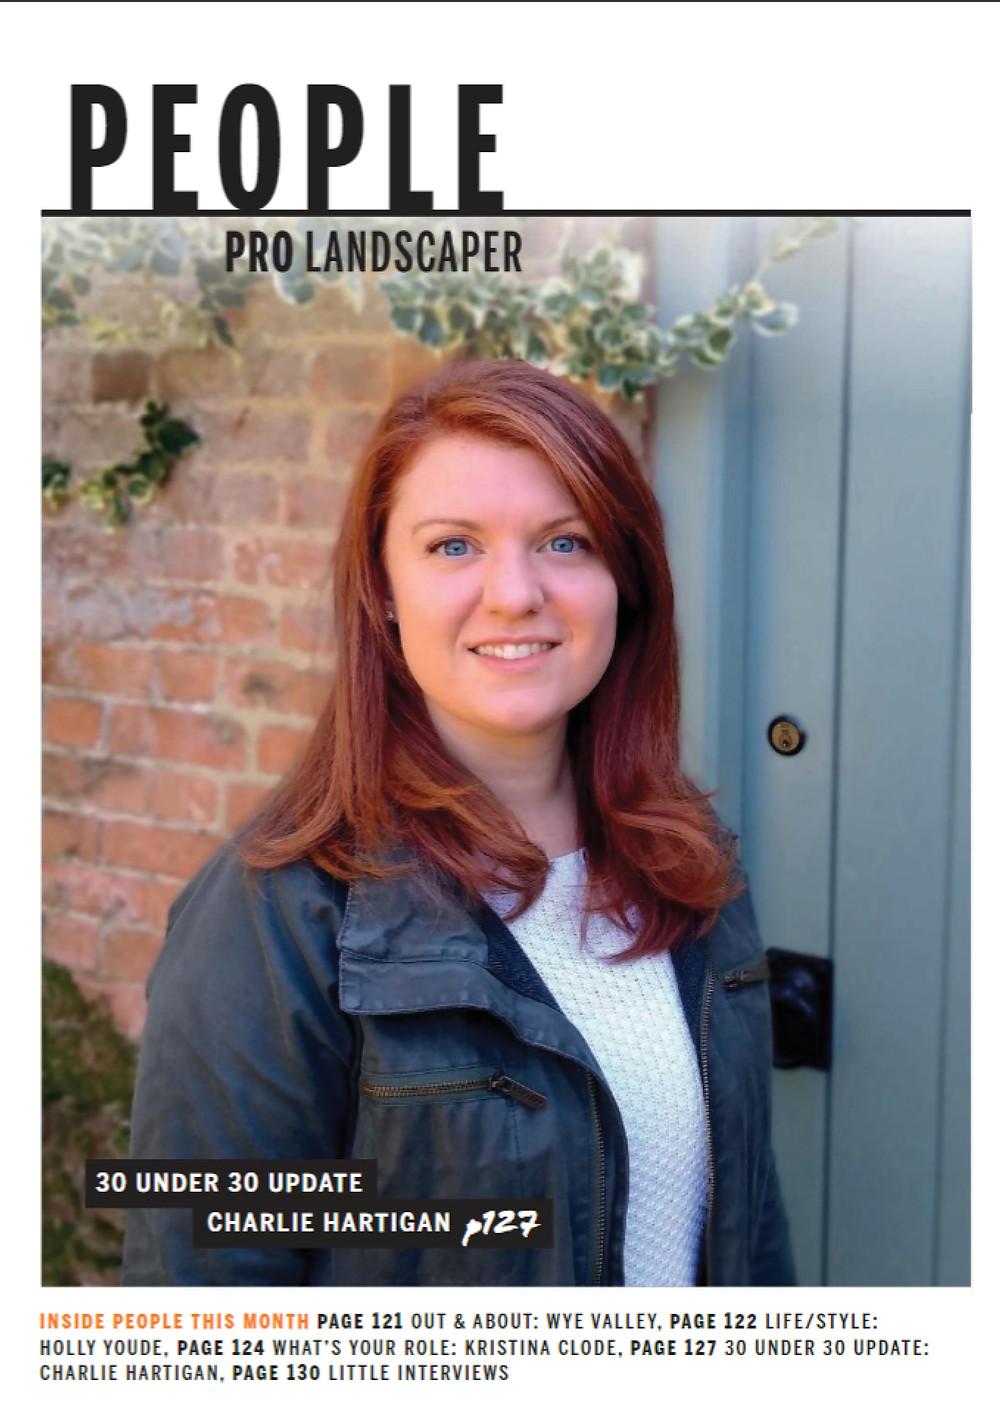 charlie hartigan pro landscaper magazine 30 under 30